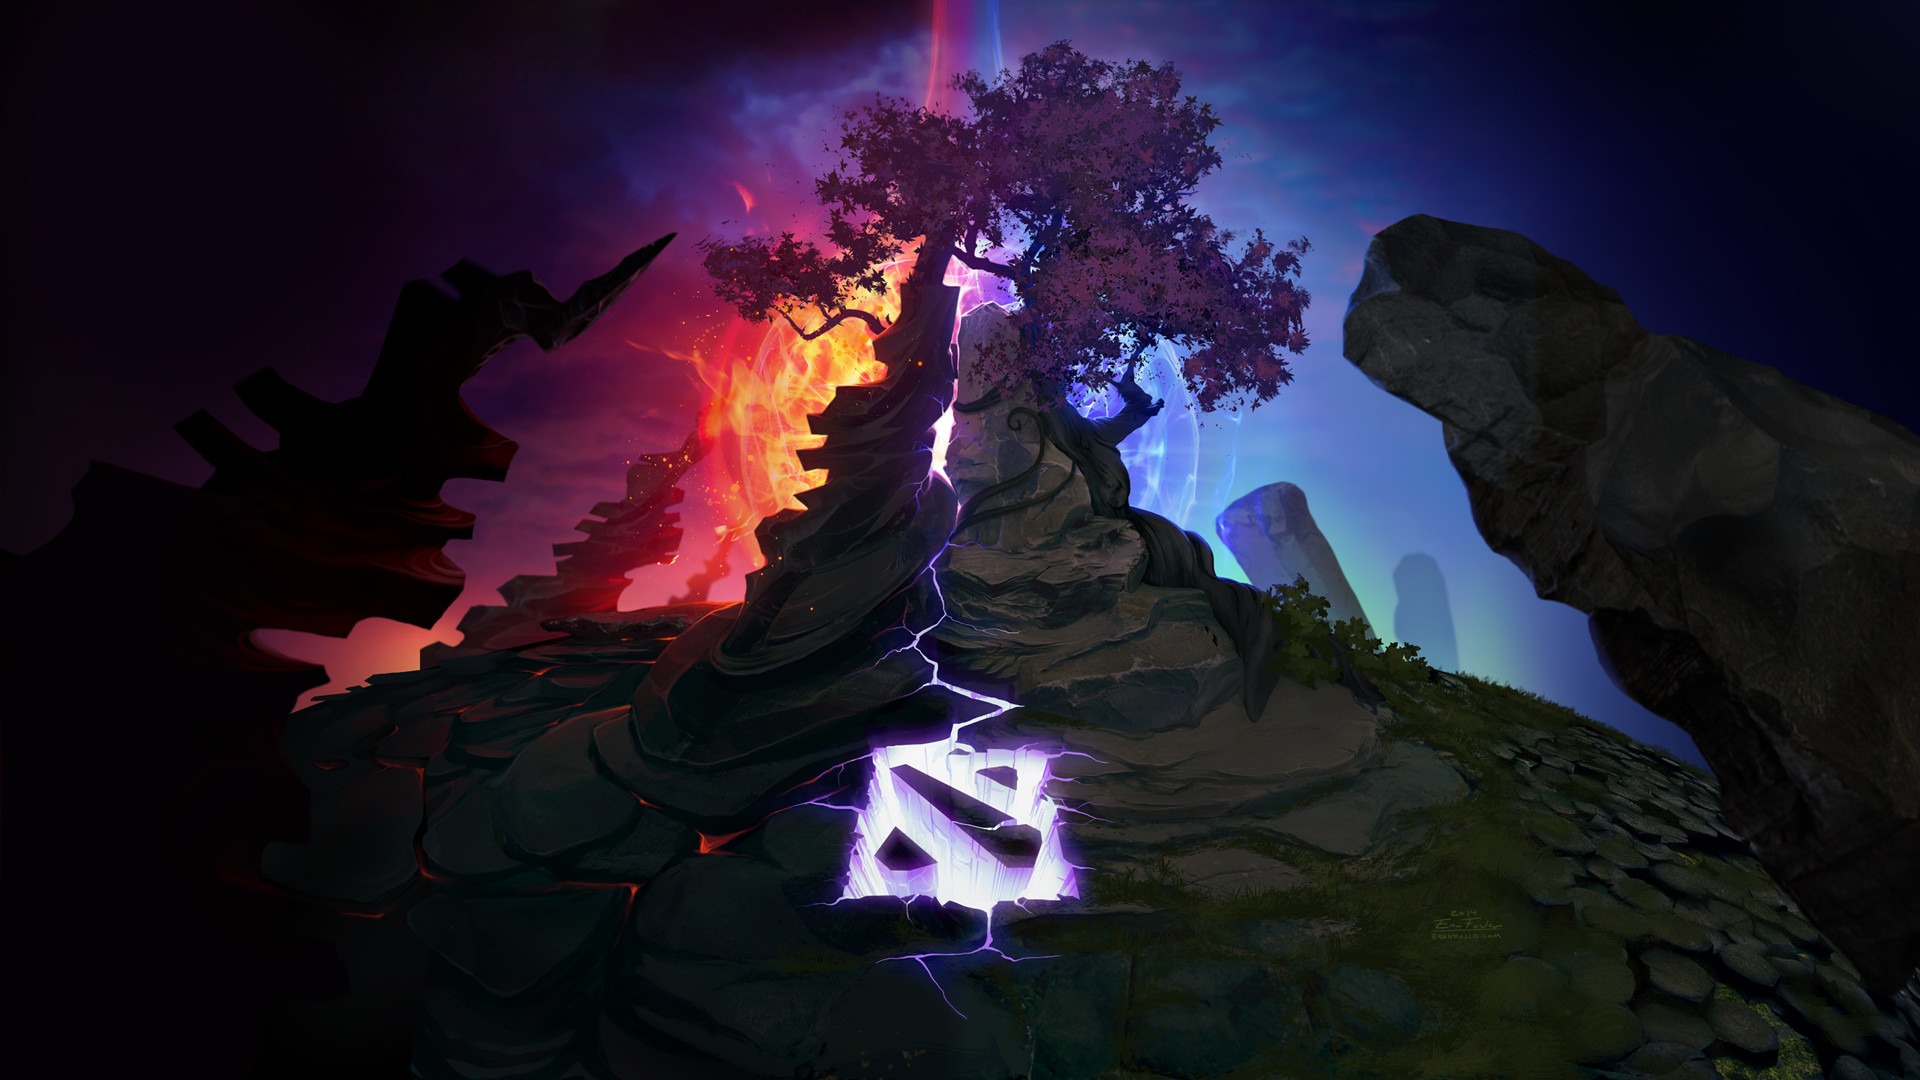 dota 2 epic logo radiant vs diretide game hd wallpaper 1080p